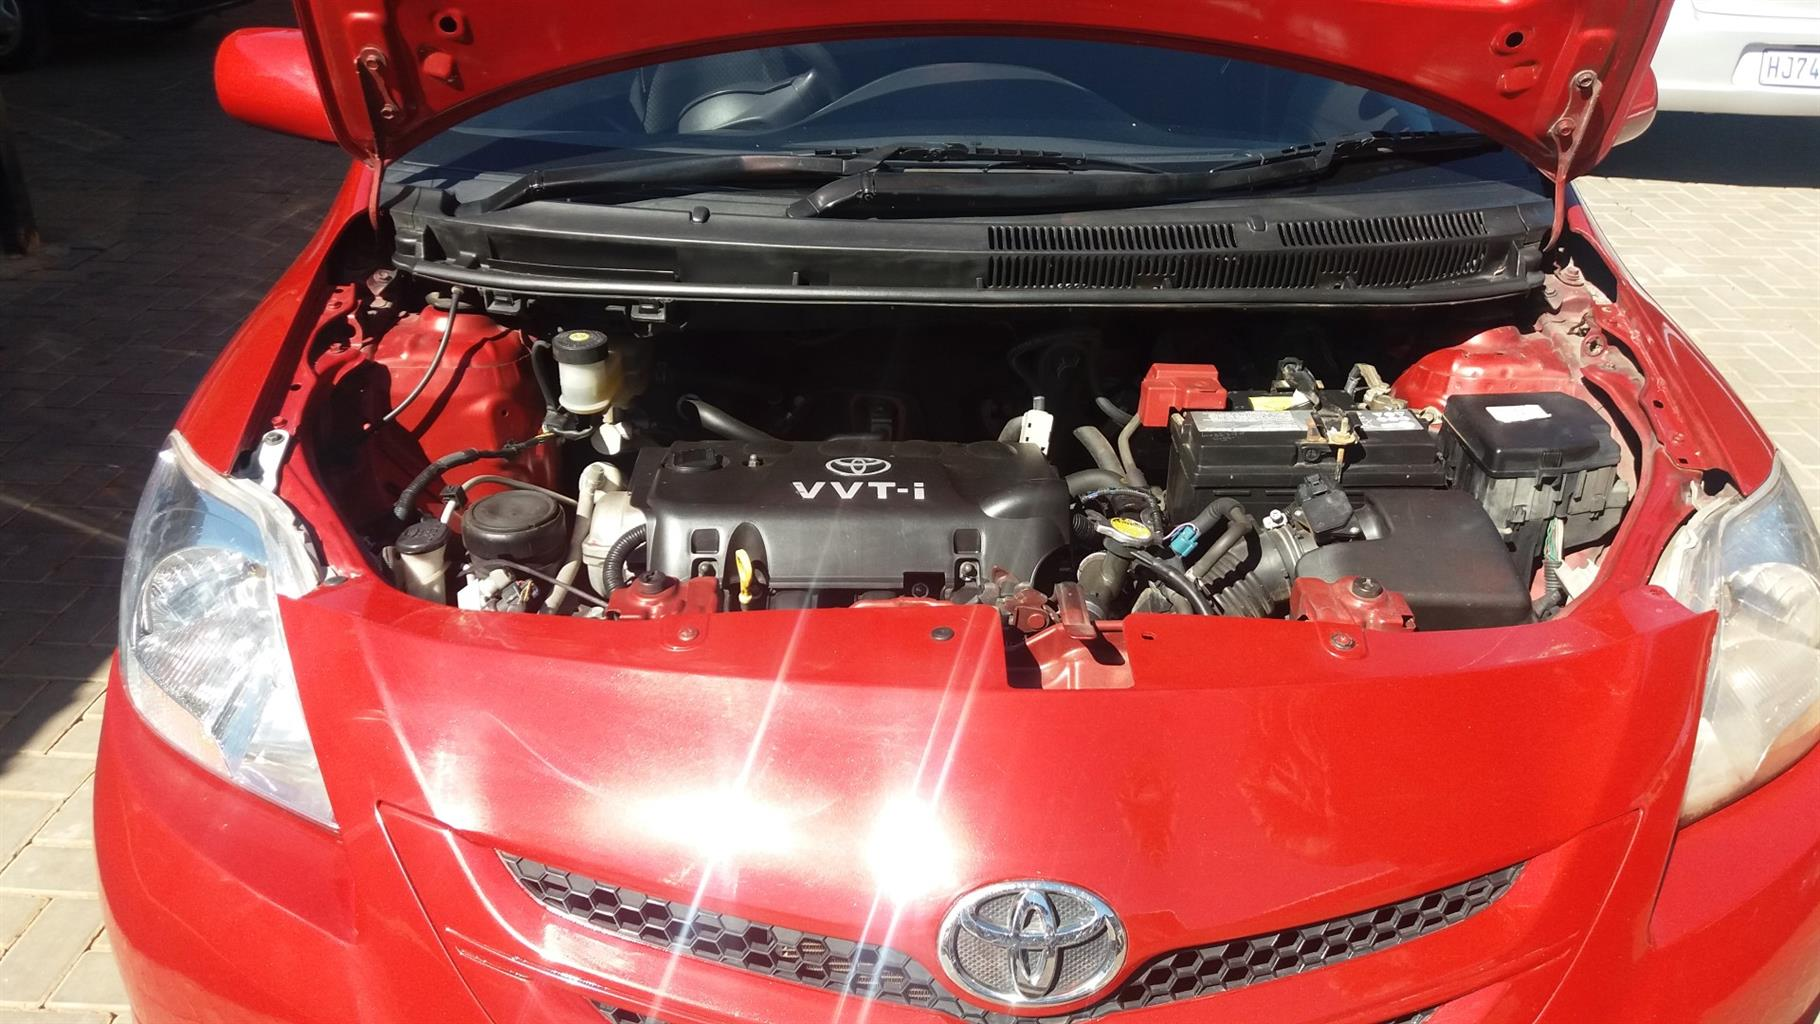 2007 Toyota Yaris 1.3 sedan T3